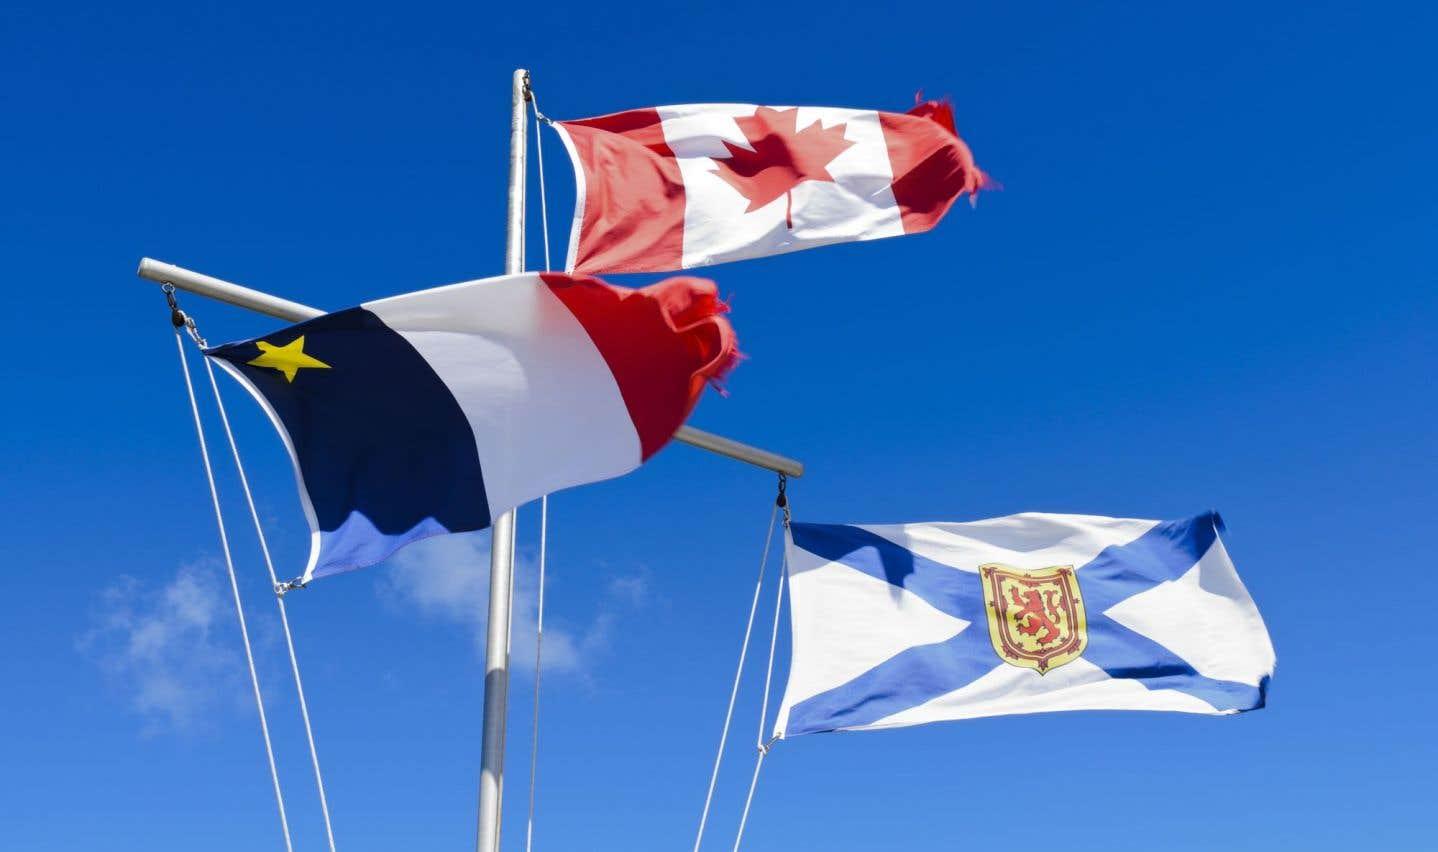 Les Acadiens furent les premiers francophones à s'établir au Canada en 1604, quatre ans avant la fondation de Québec.